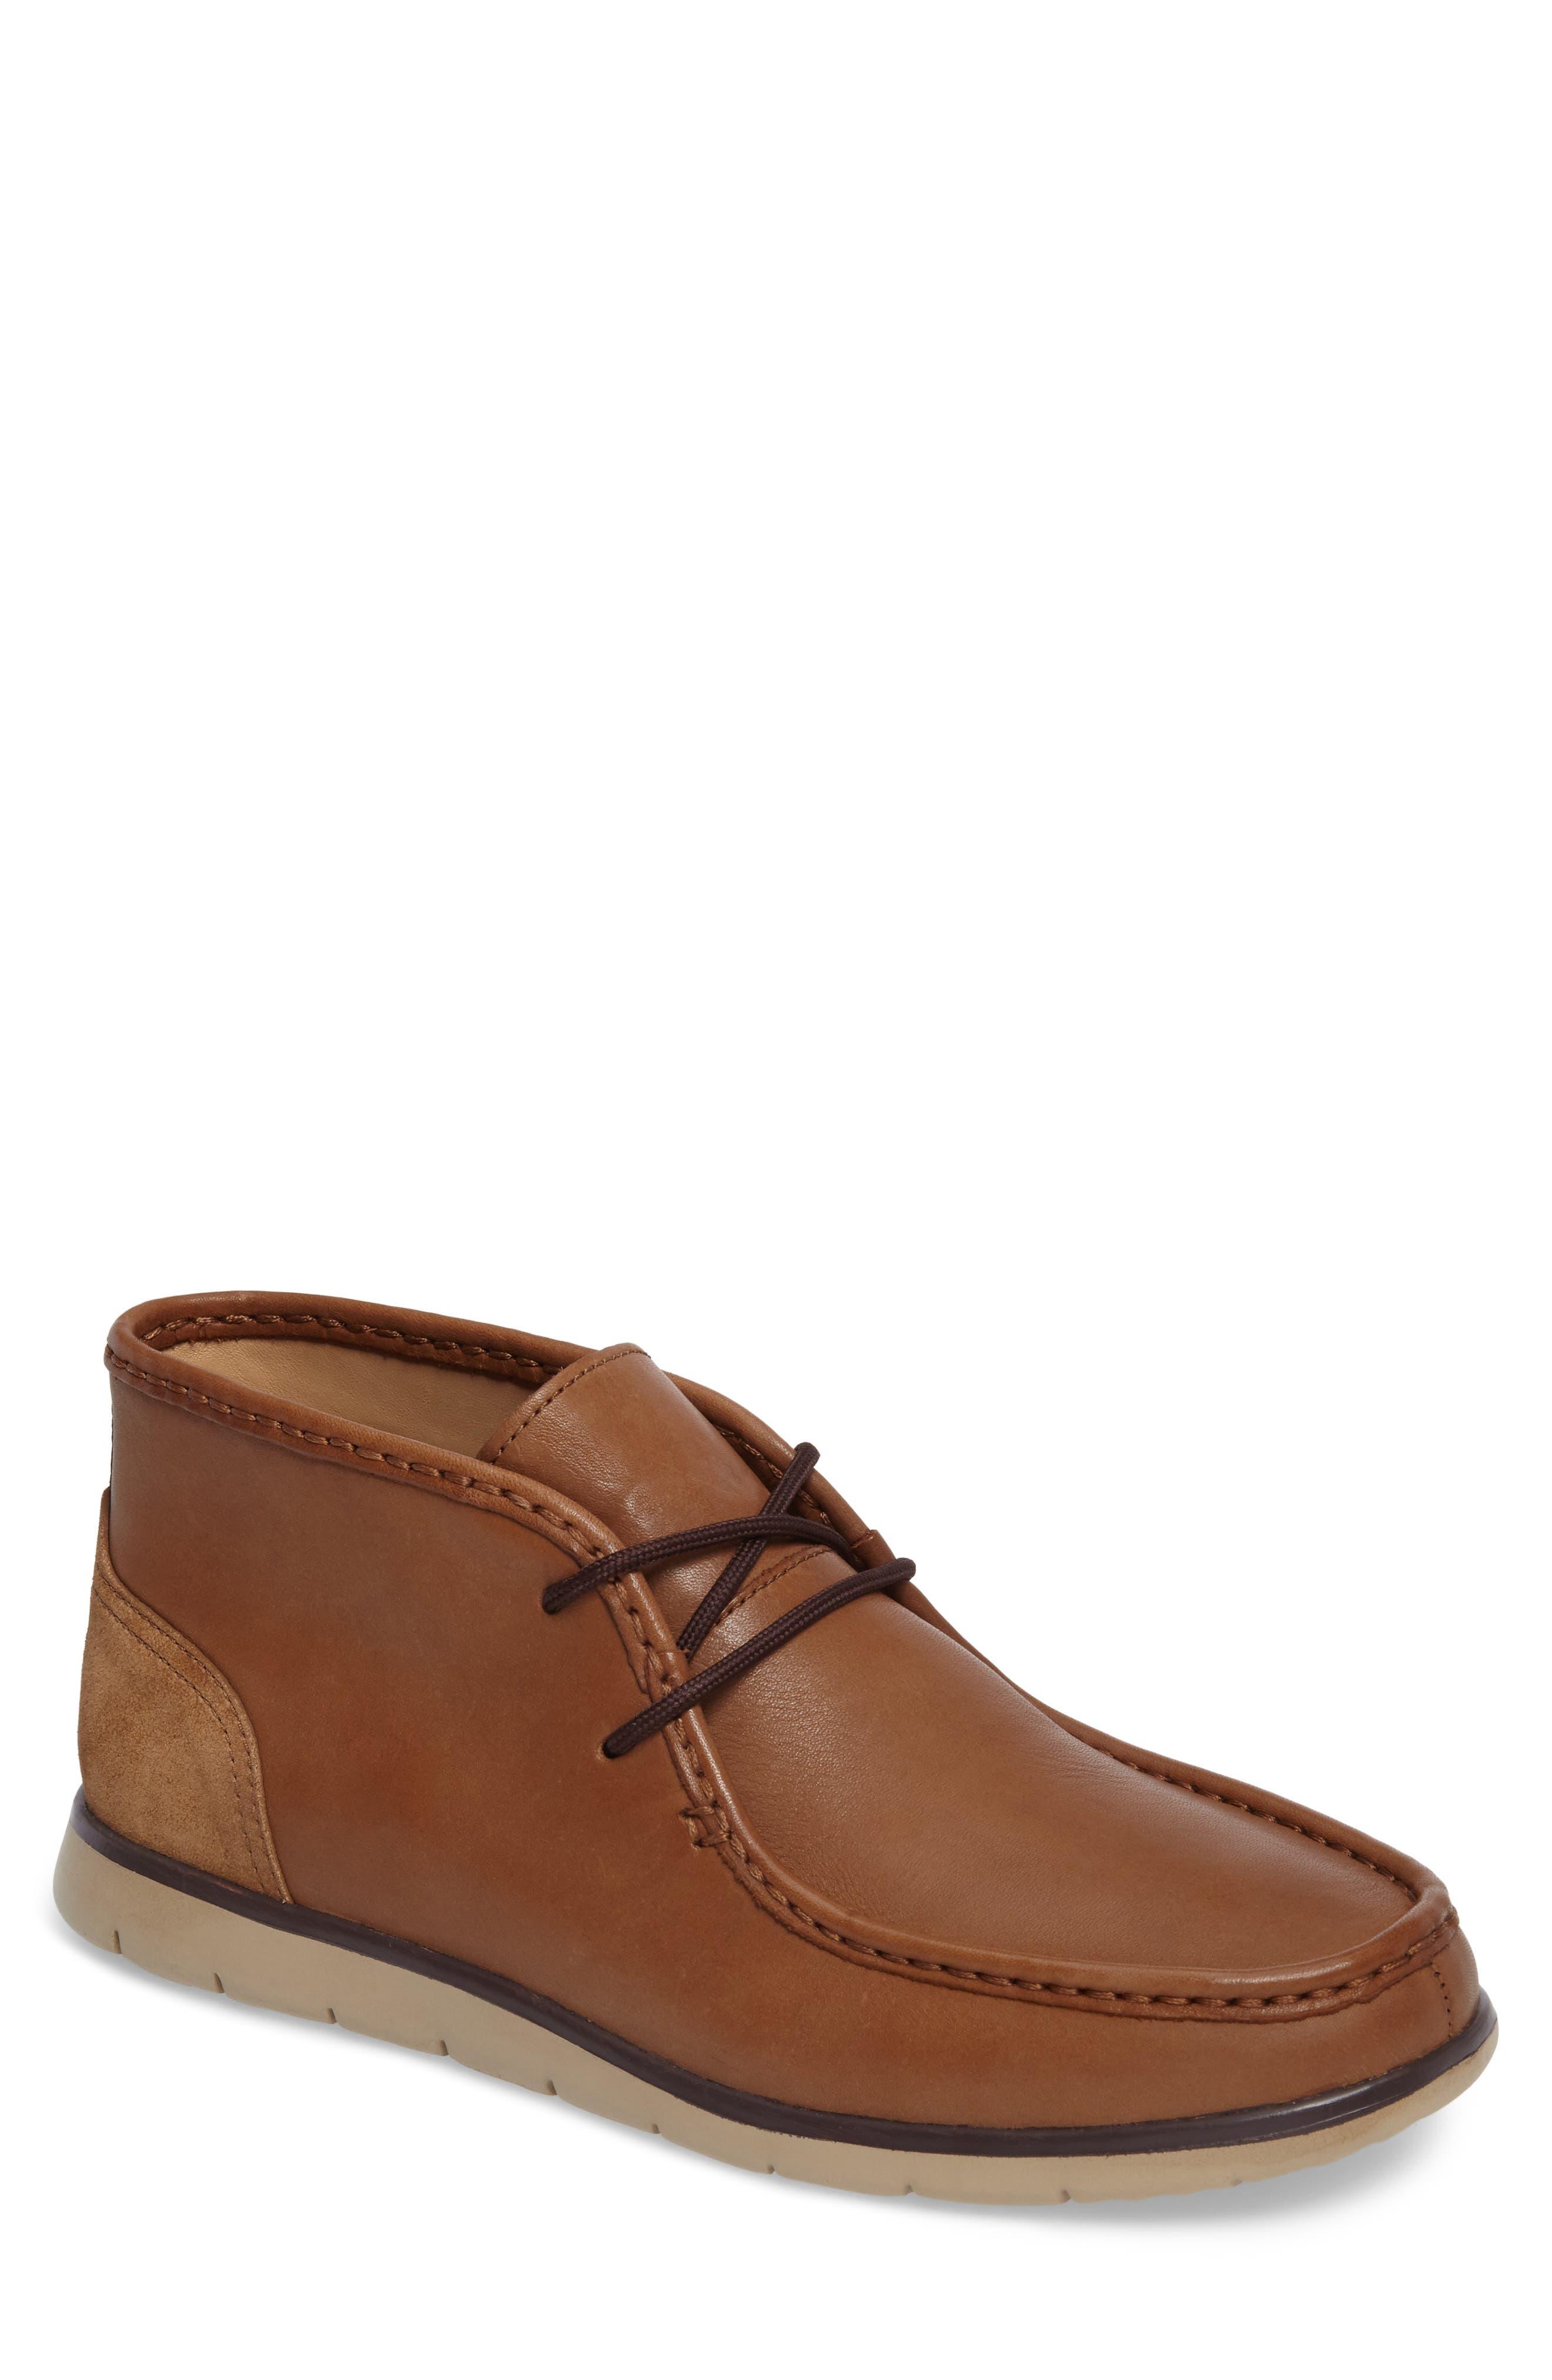 Alternate Image 1 Selected - UGG® 'Hendrickson' Chukka Boot (Men)